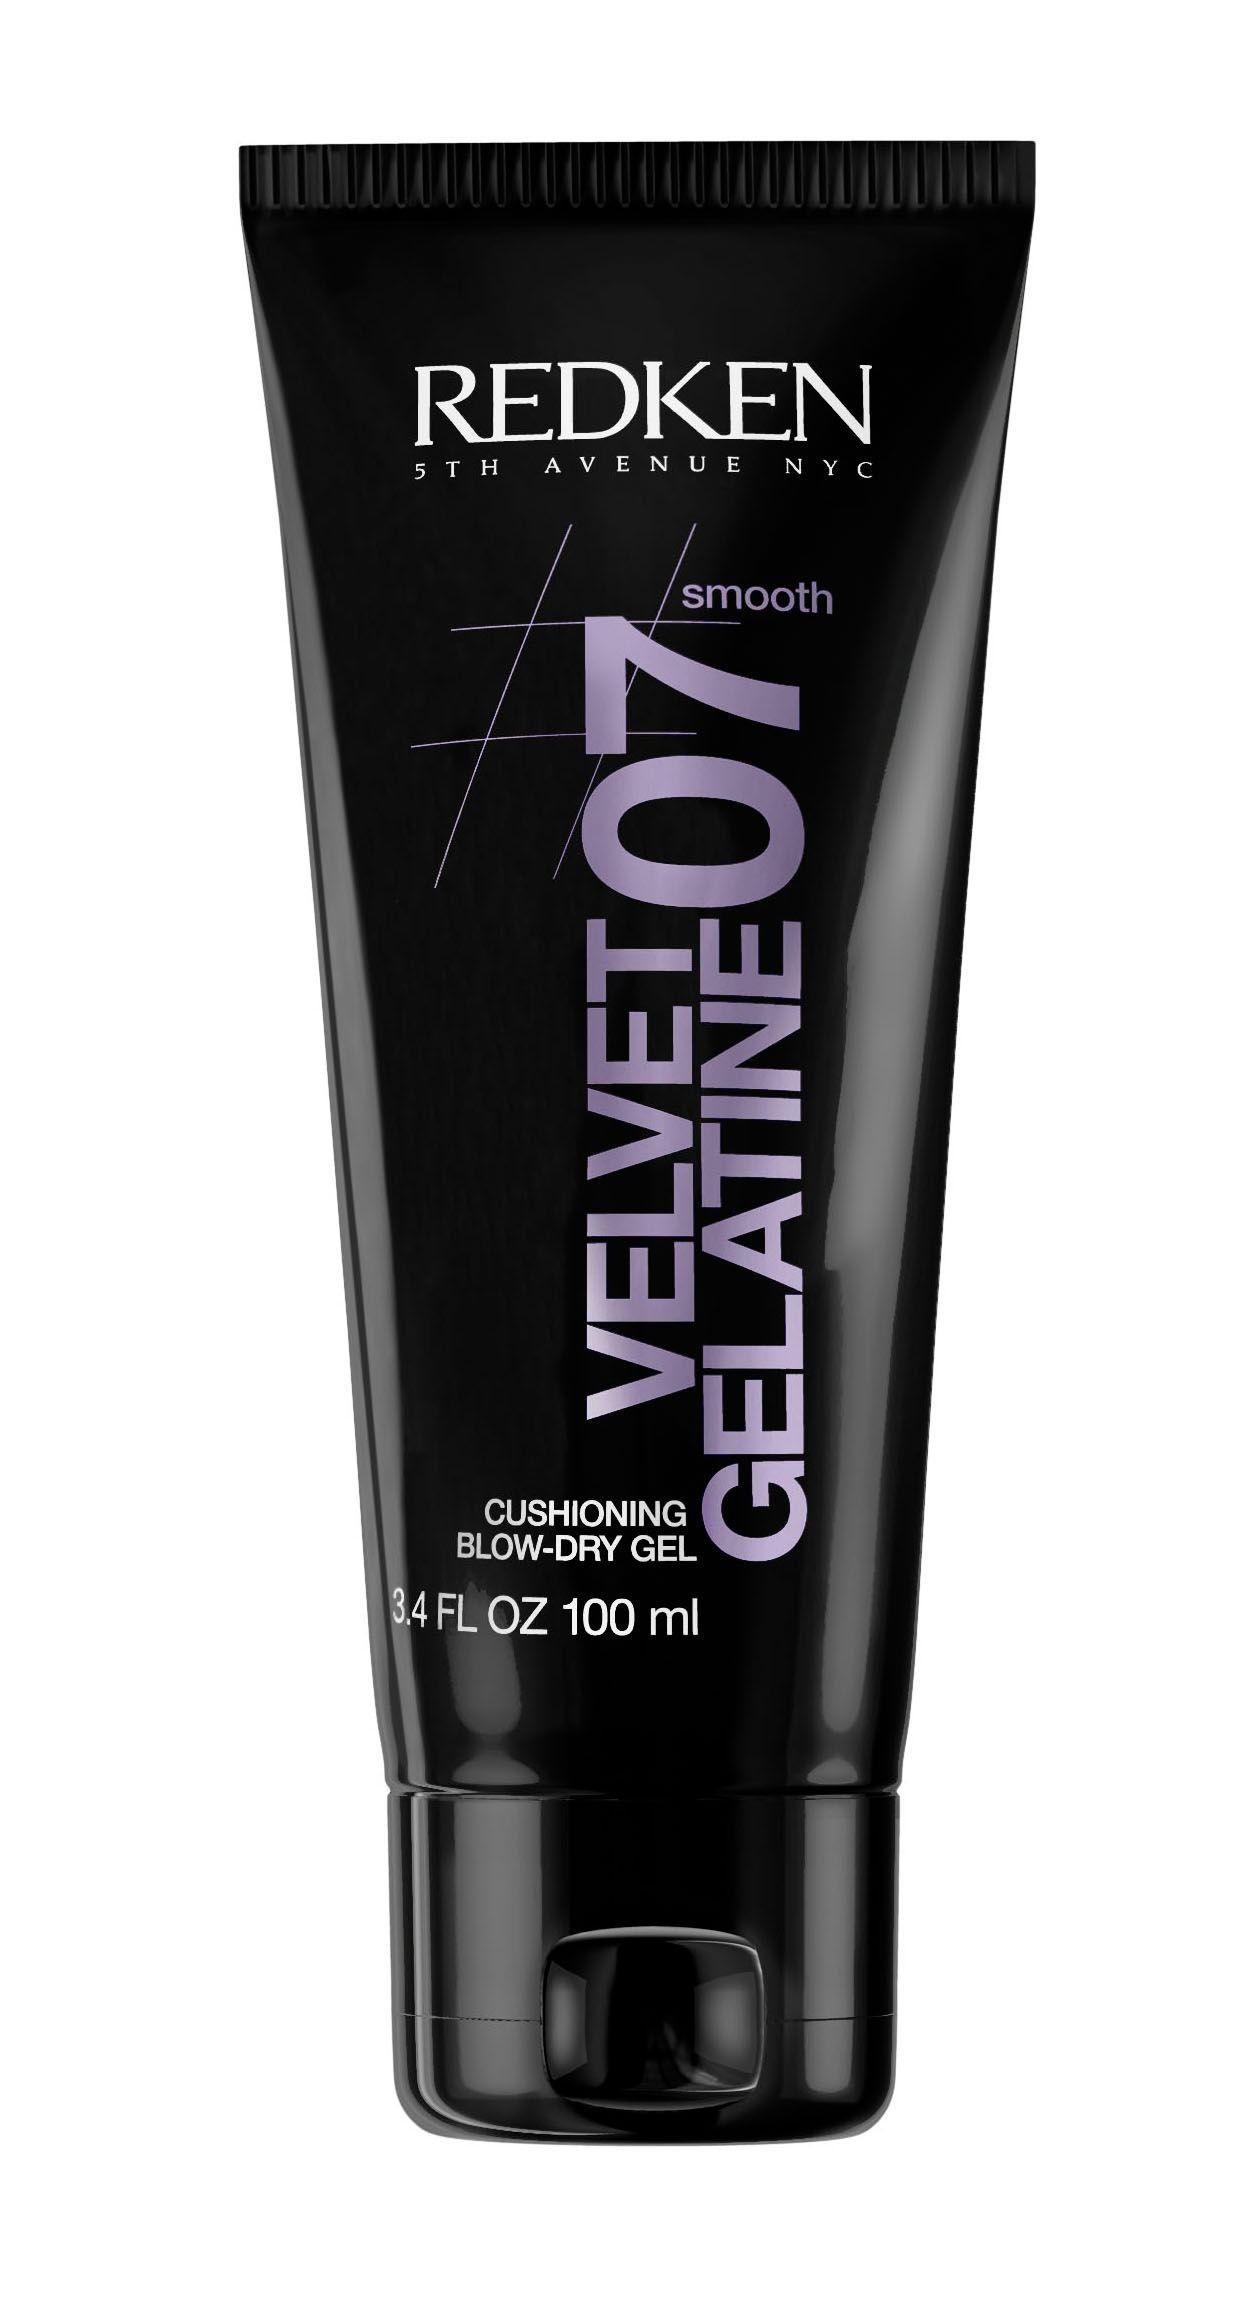 Redken Smooth Velvet Gelatine 07 Cushioning Blow Dry Gel 100ml